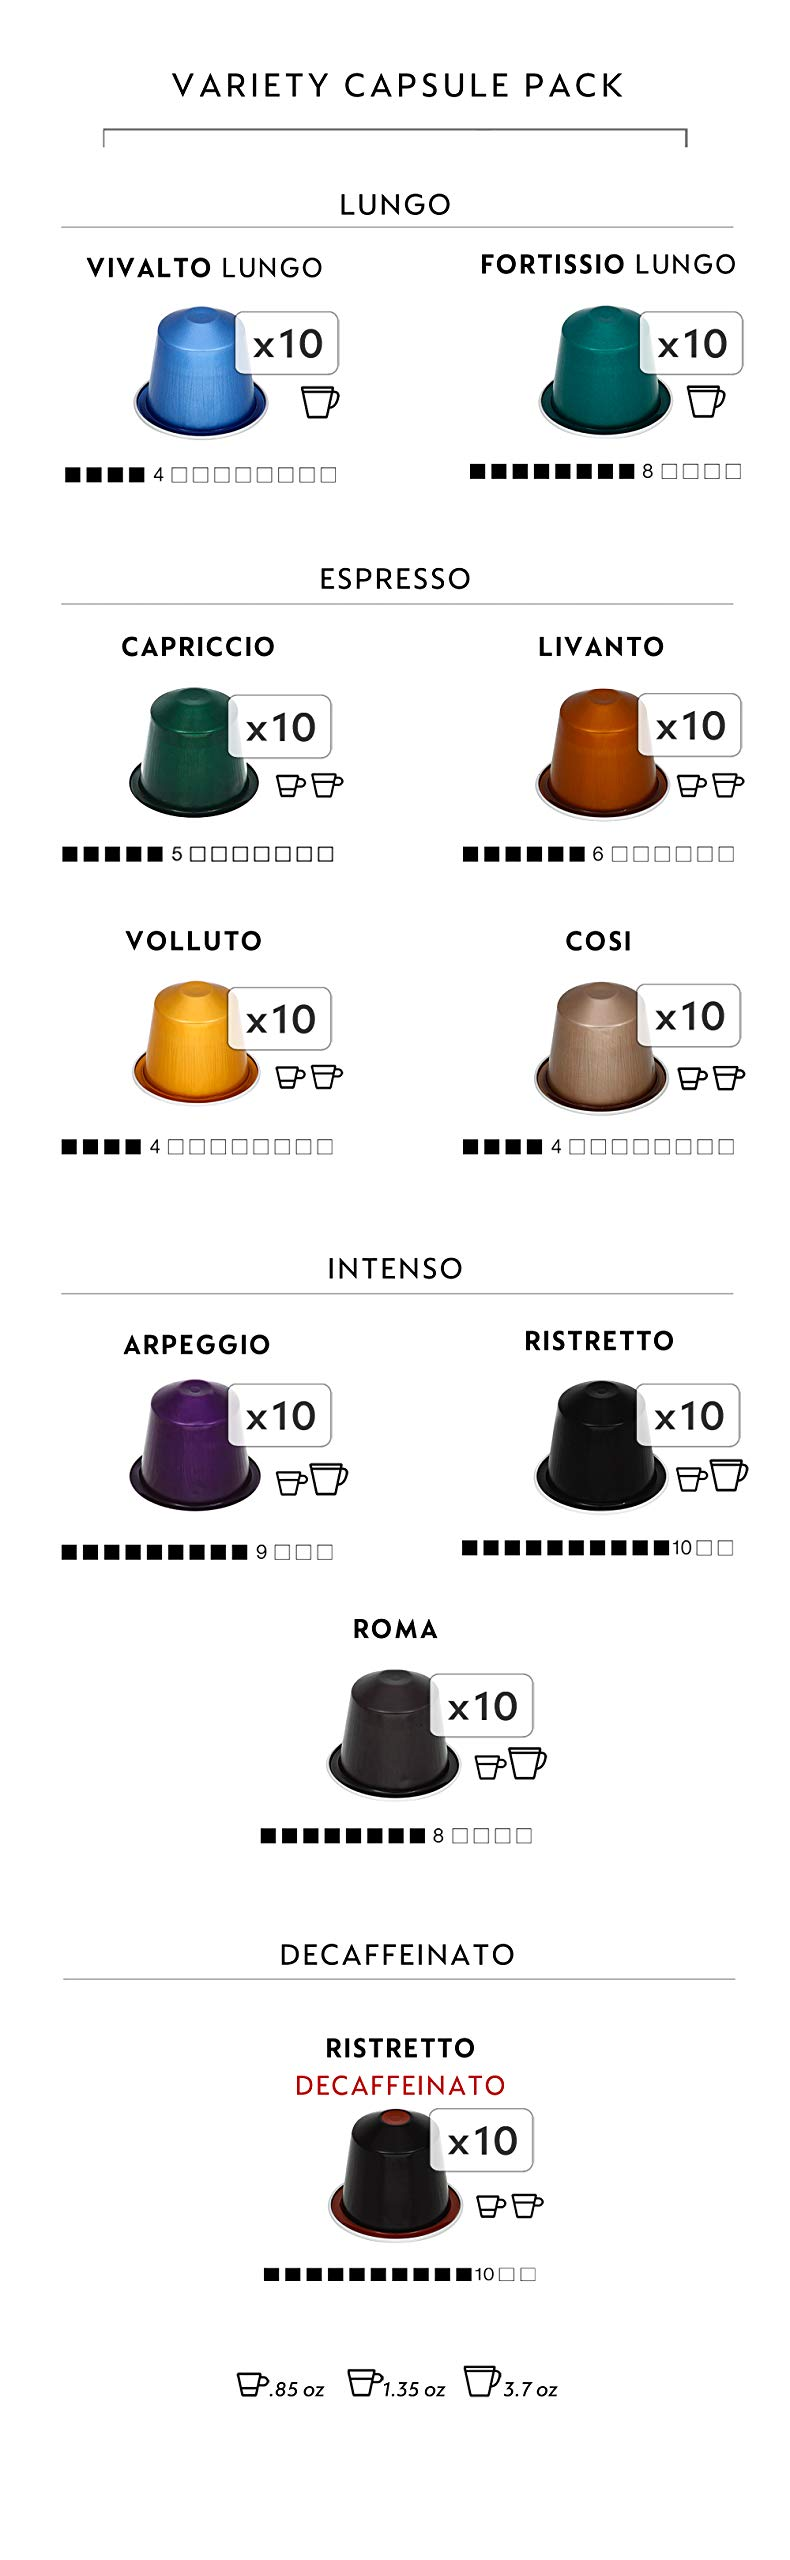 Nespresso OriginalLine Espresso Capsules Variety Pack, 100 Count by Nestle Nespresso (Image #2)